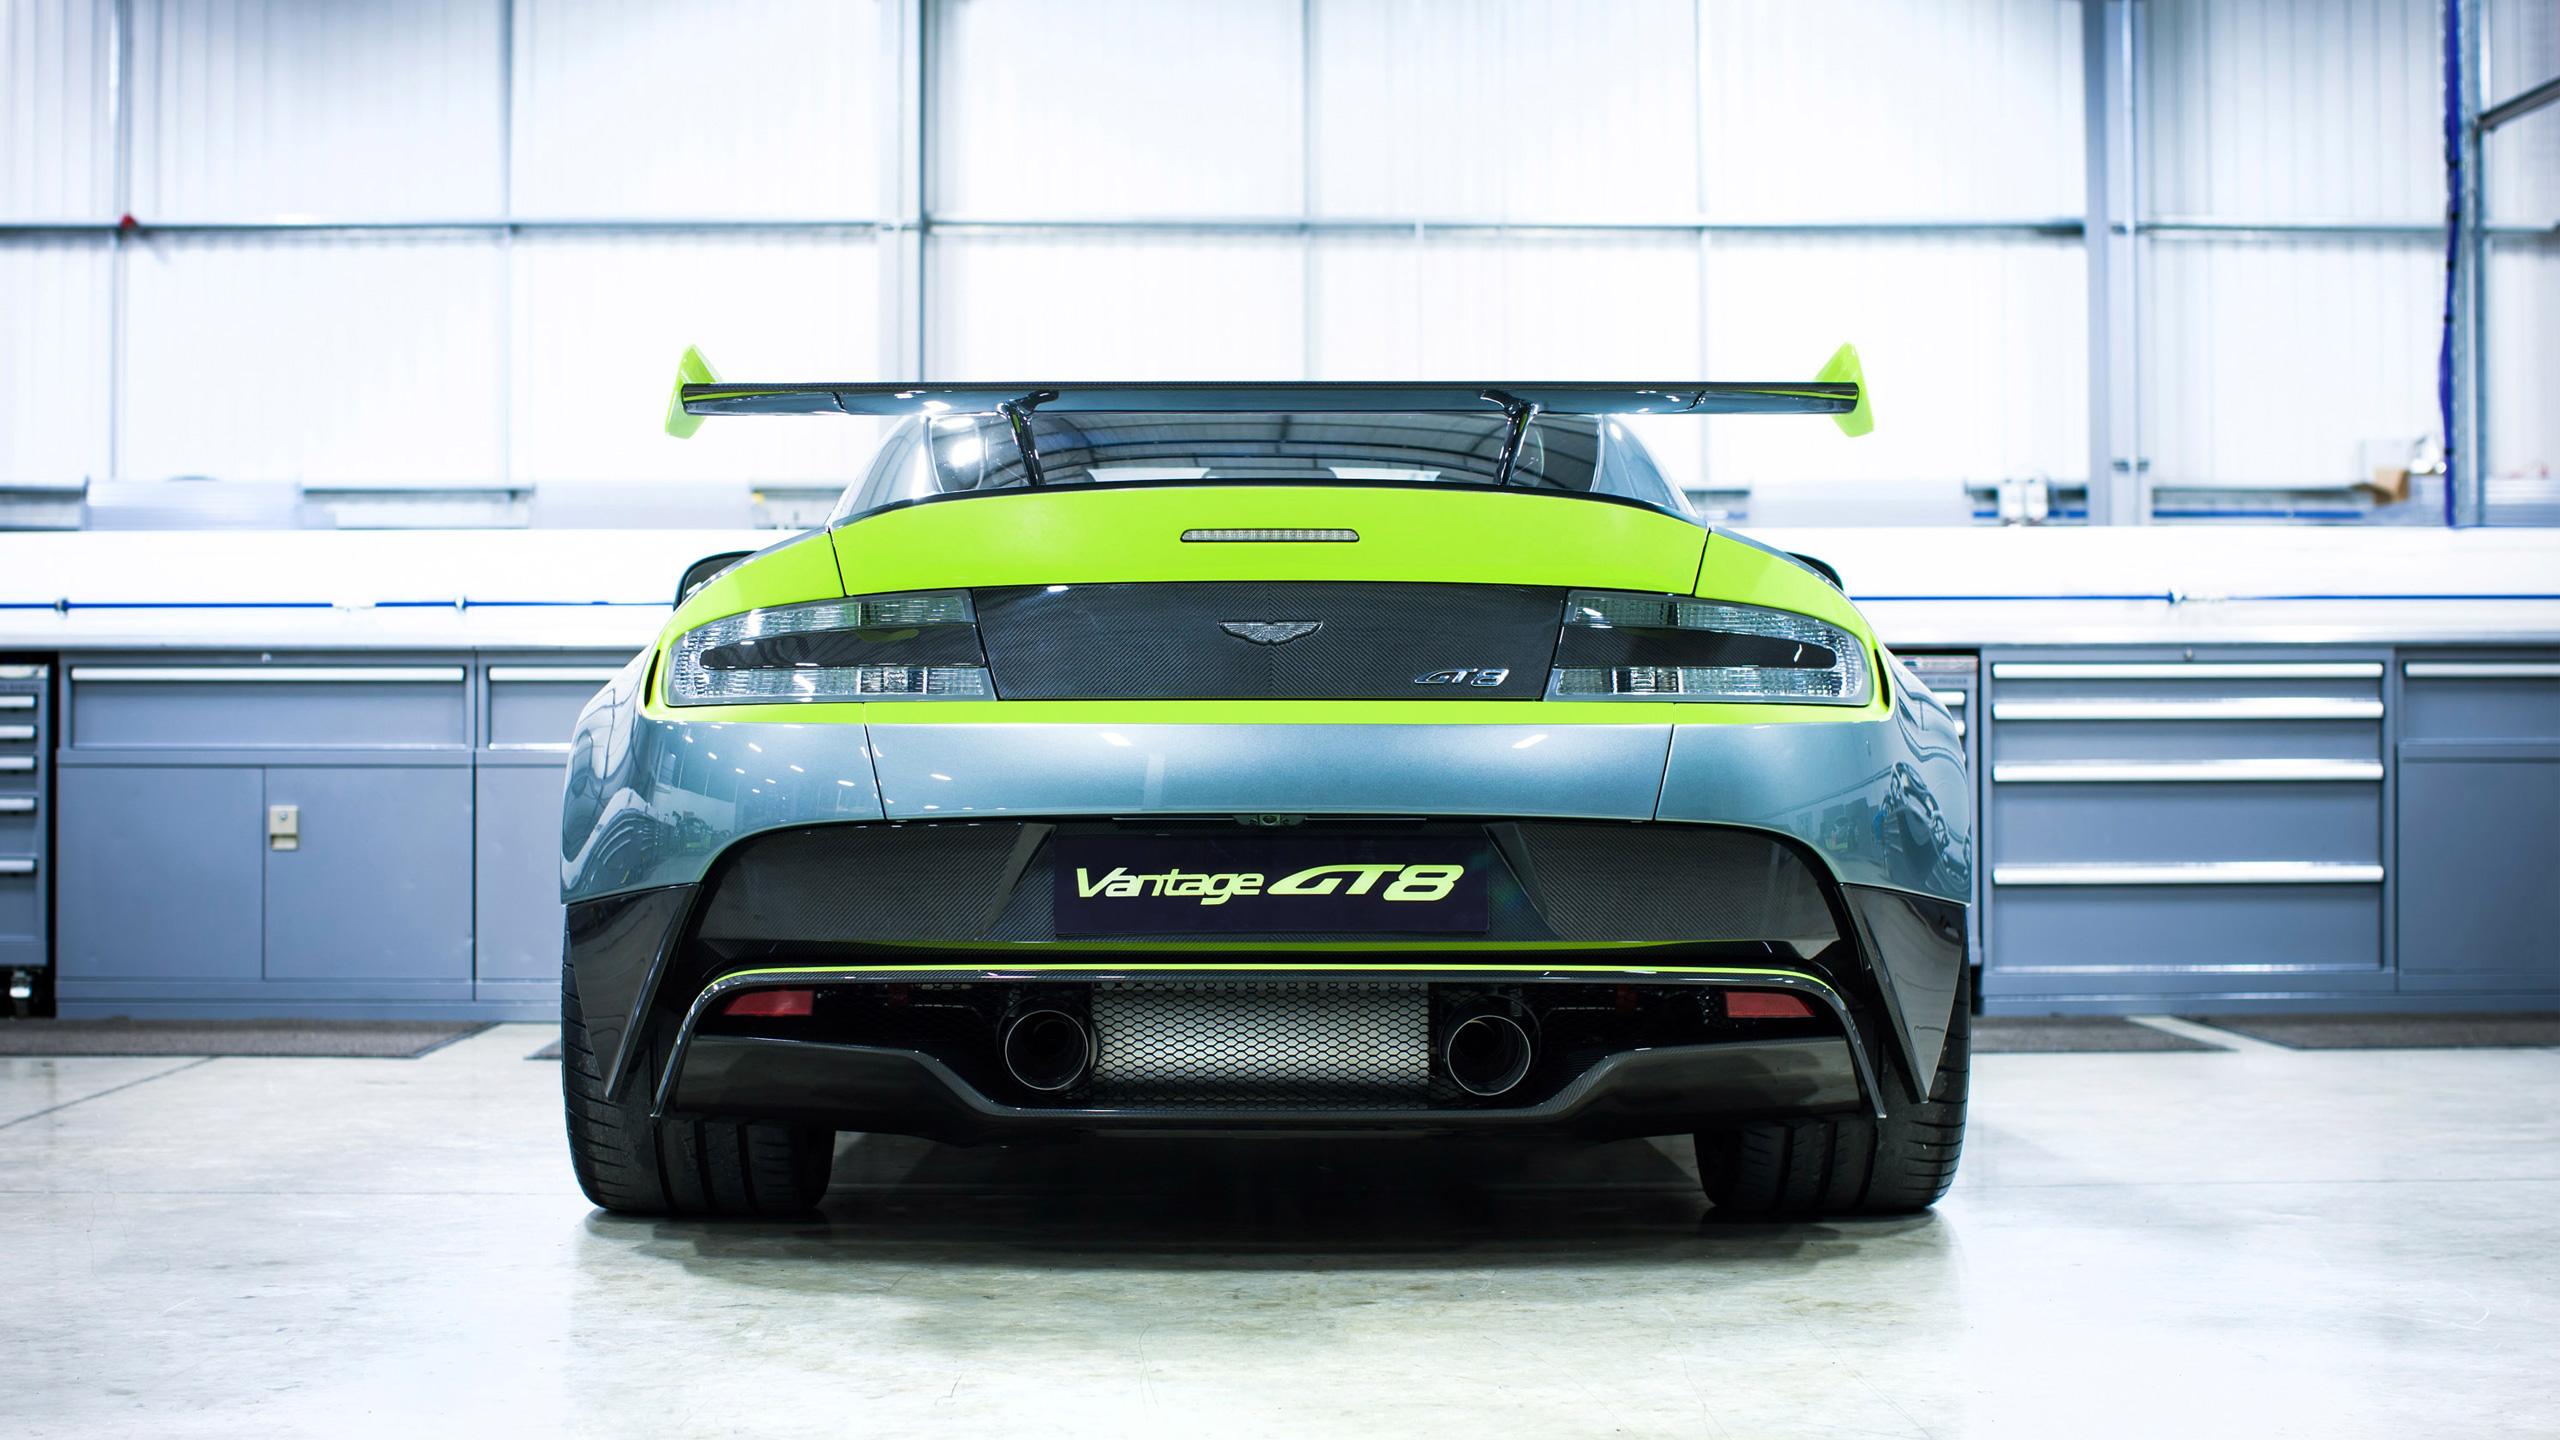 2016 Aston Martin Vantage Gt8 Rear View Wallpaper Hd Car Wallpapers Id 6439